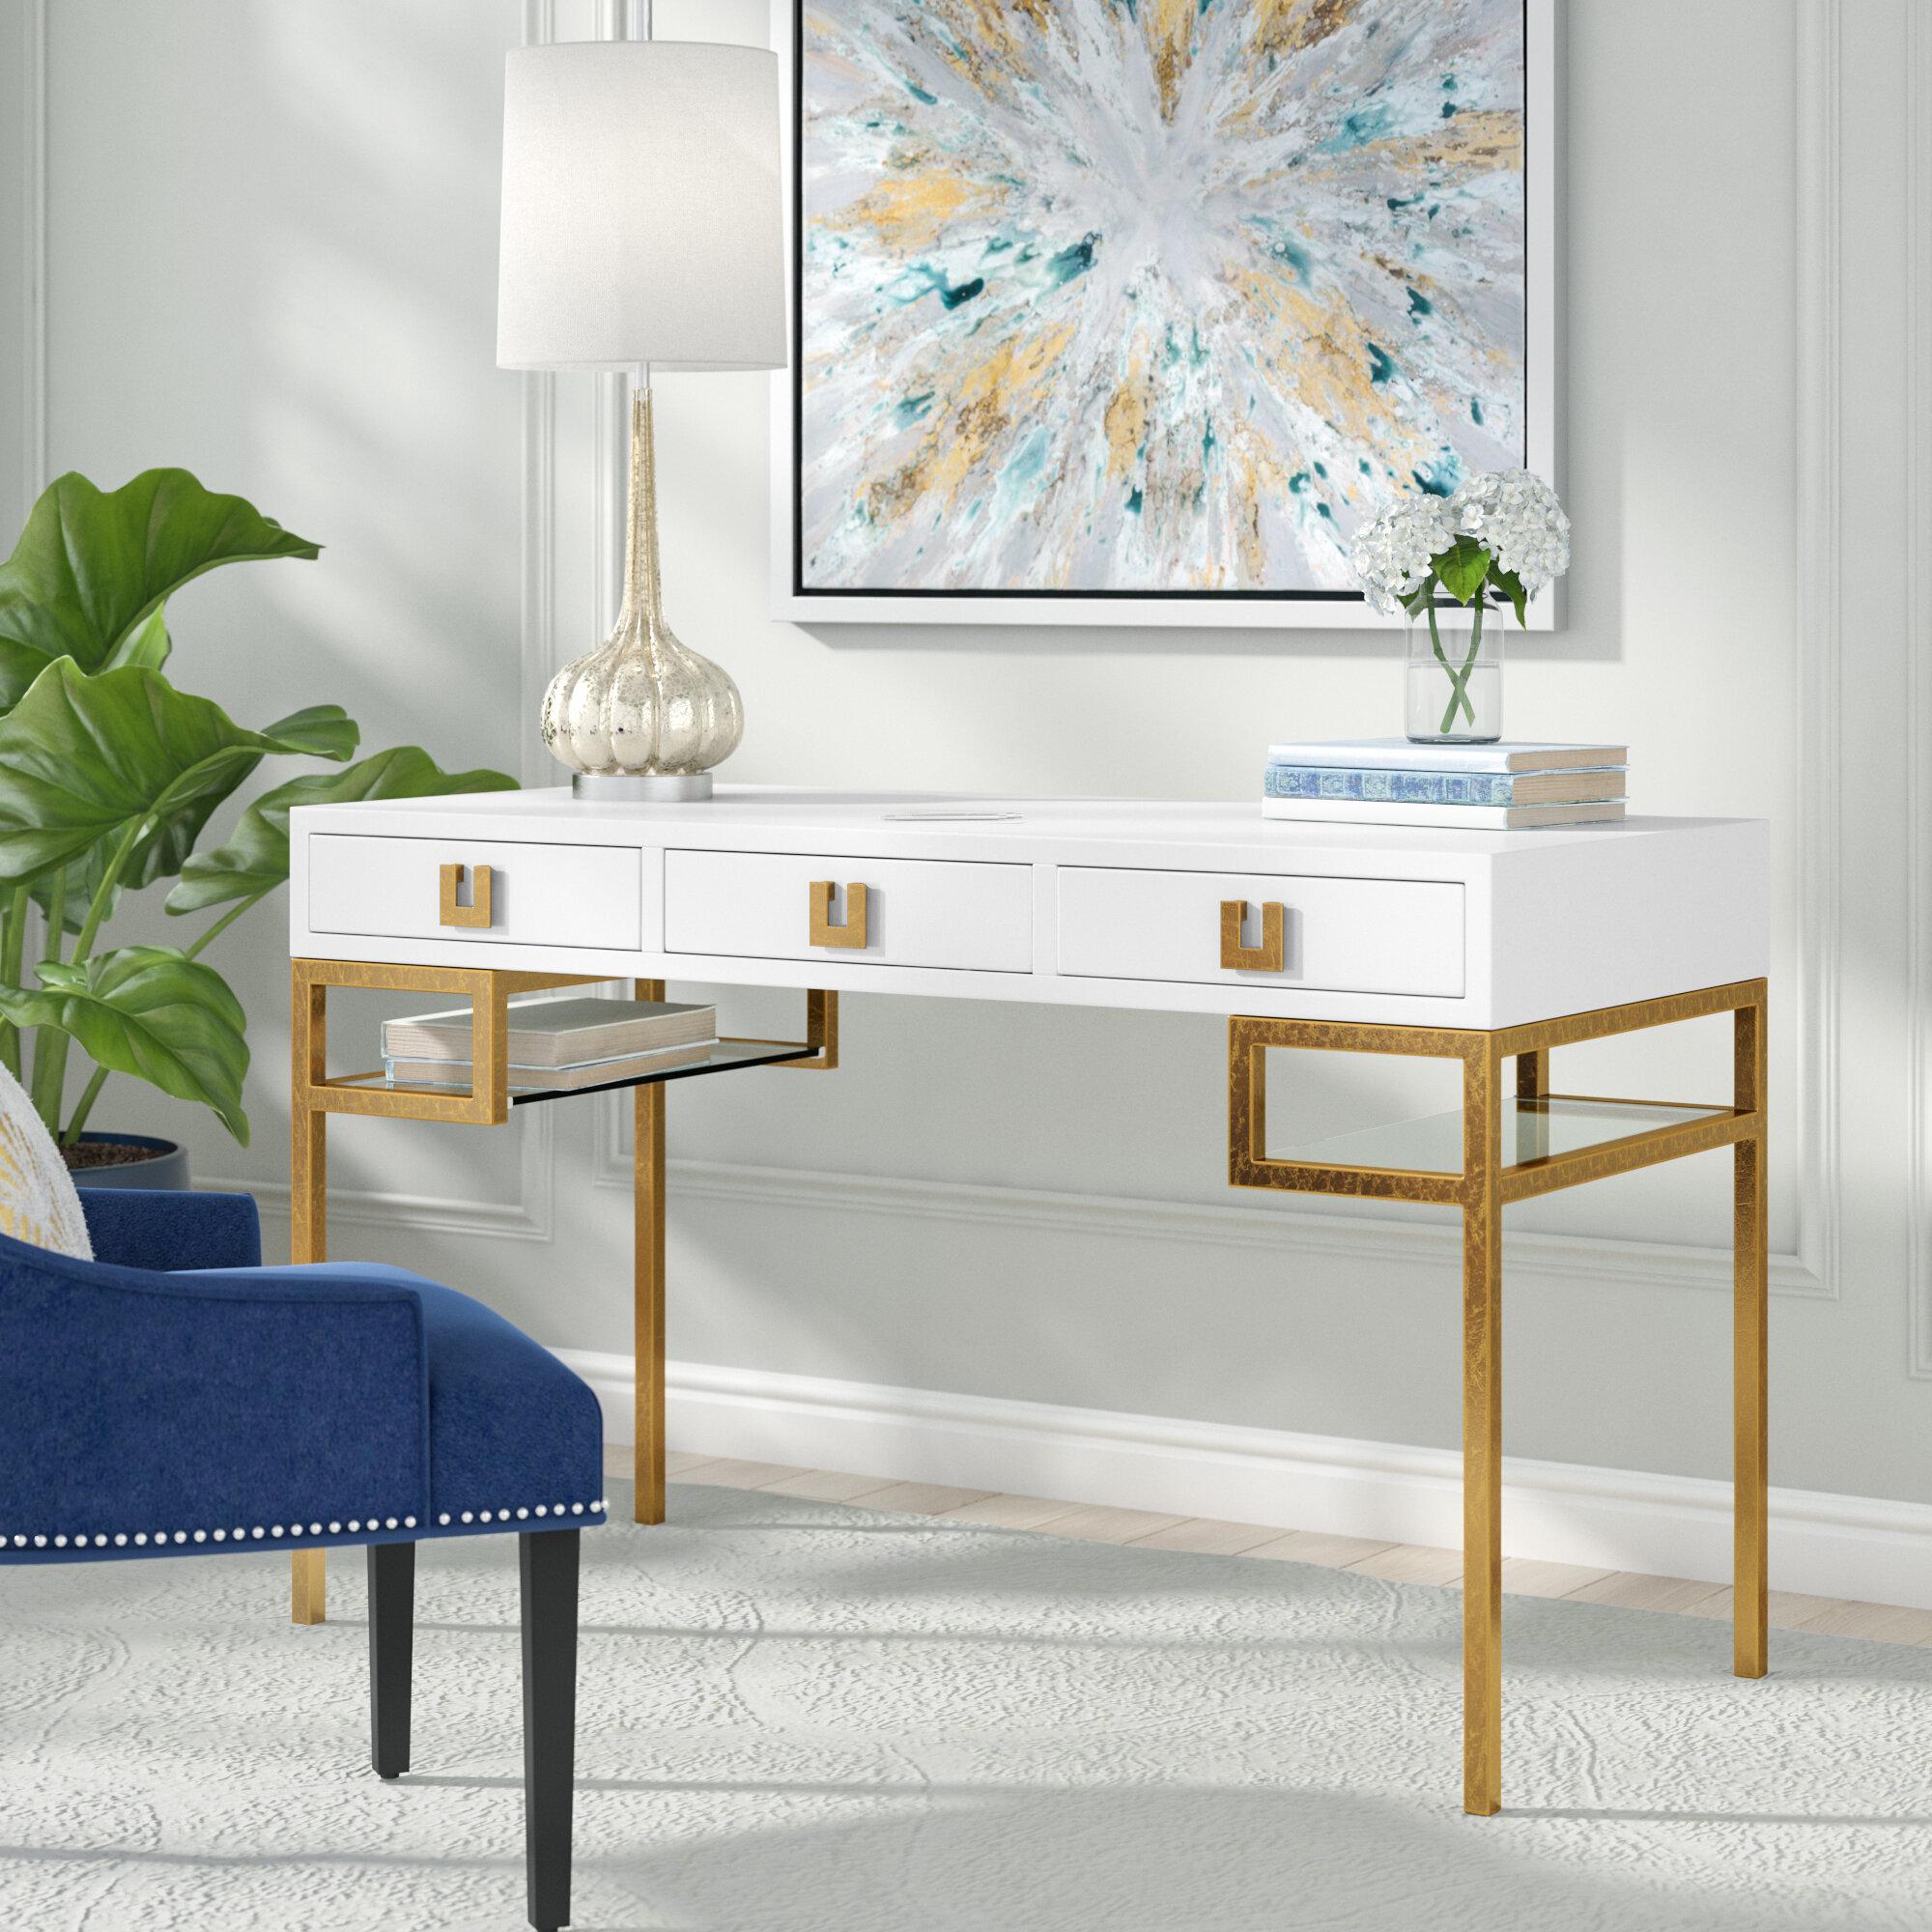 Willa Arlo Interiors Angilia Writing Desk | Wayfair